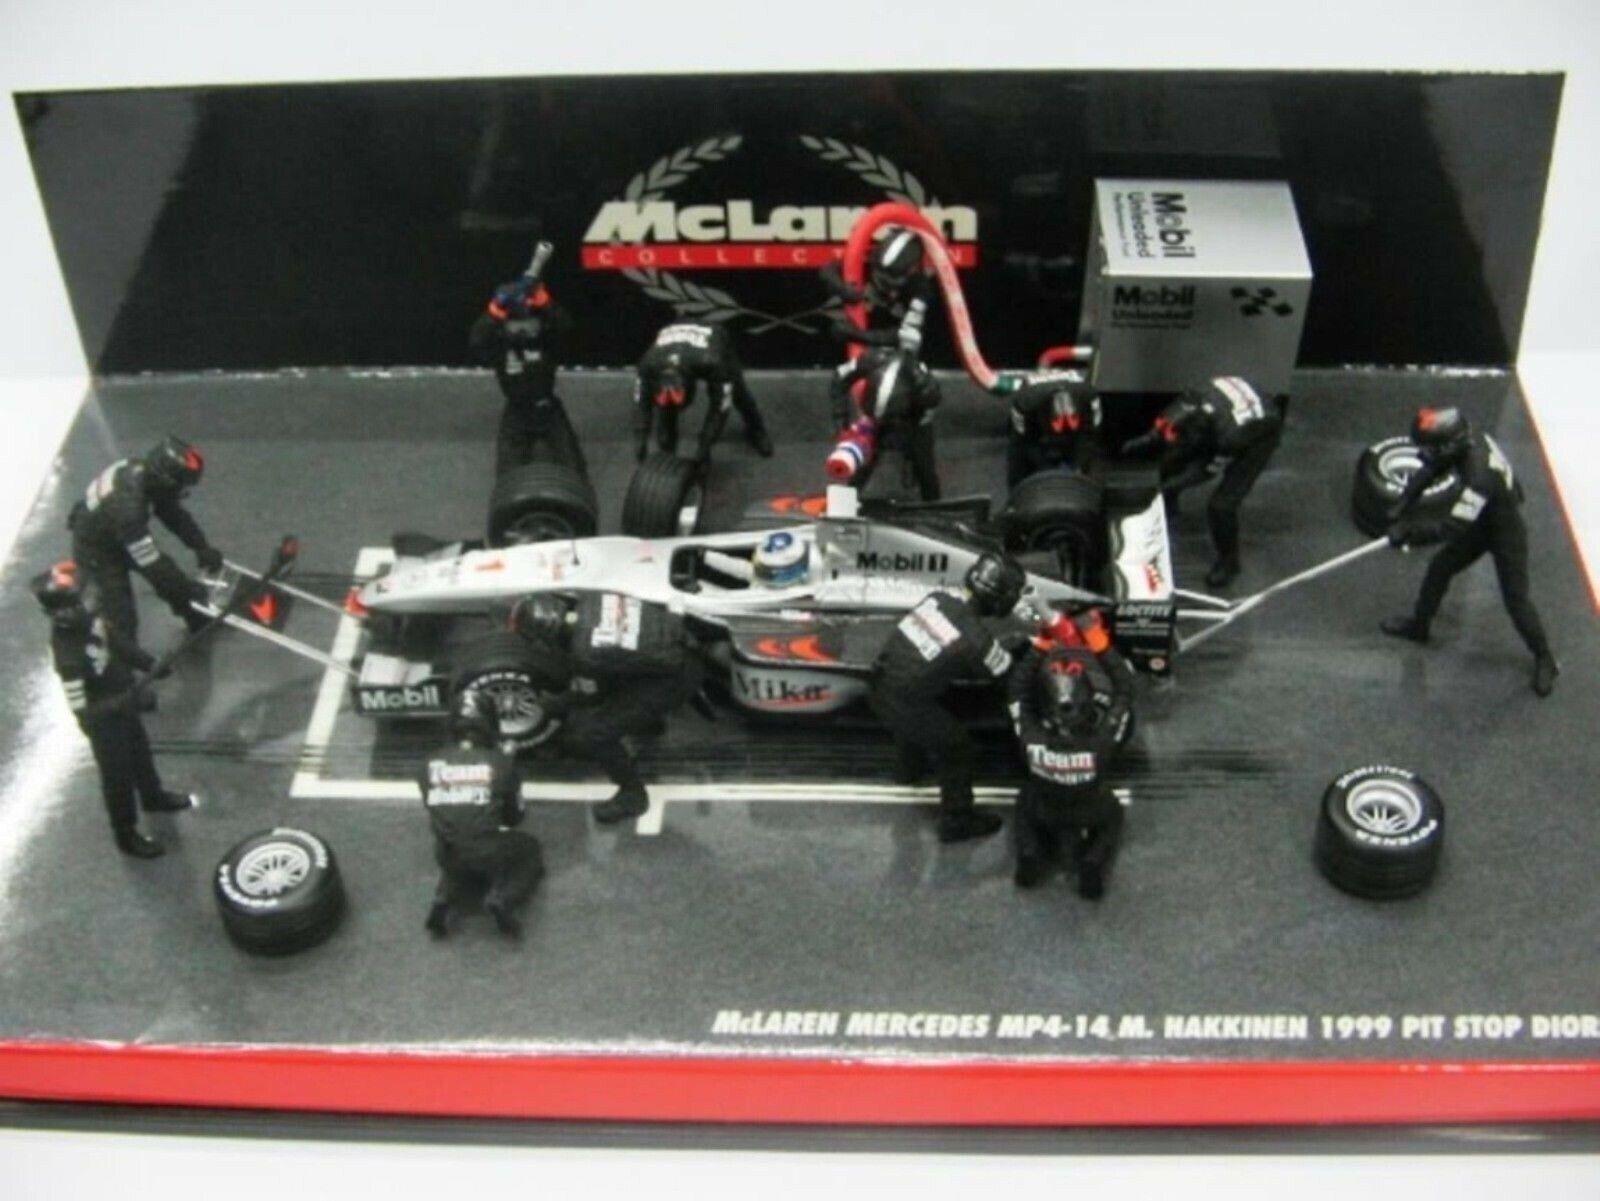 Wow extremadonnate raro McLaren 1999 MP4 14 MB Parada dio obligaba 1 43 Minichamps